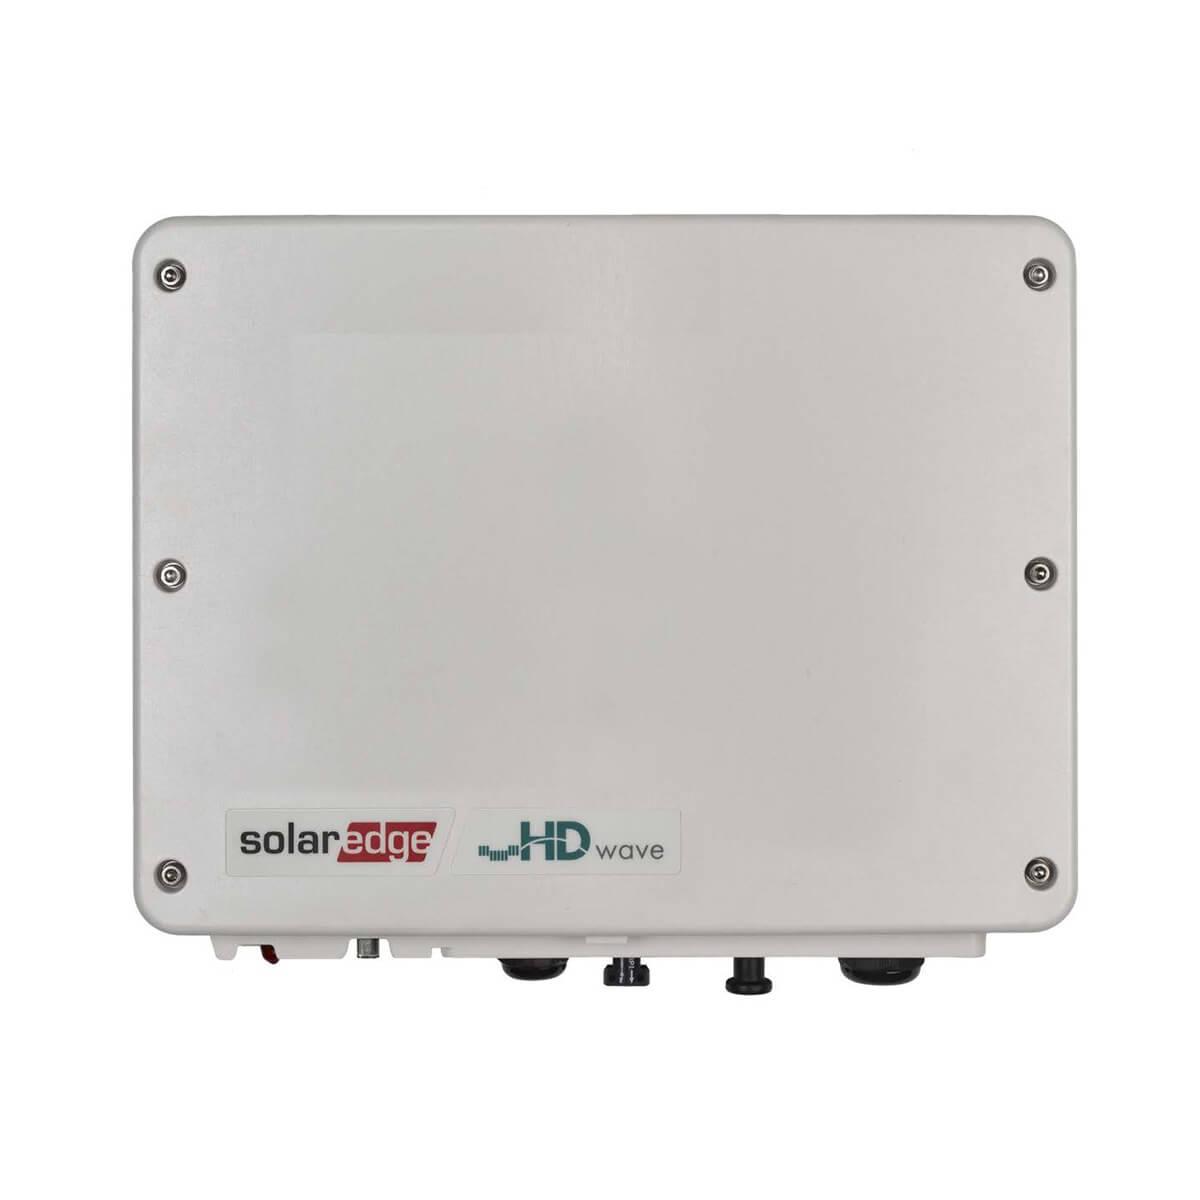 solaredge 5kW inverter, solaredge se5000h 5kW inverter, solaredge se5000h inverter, solaredge se5000h, solaredge 5 kW